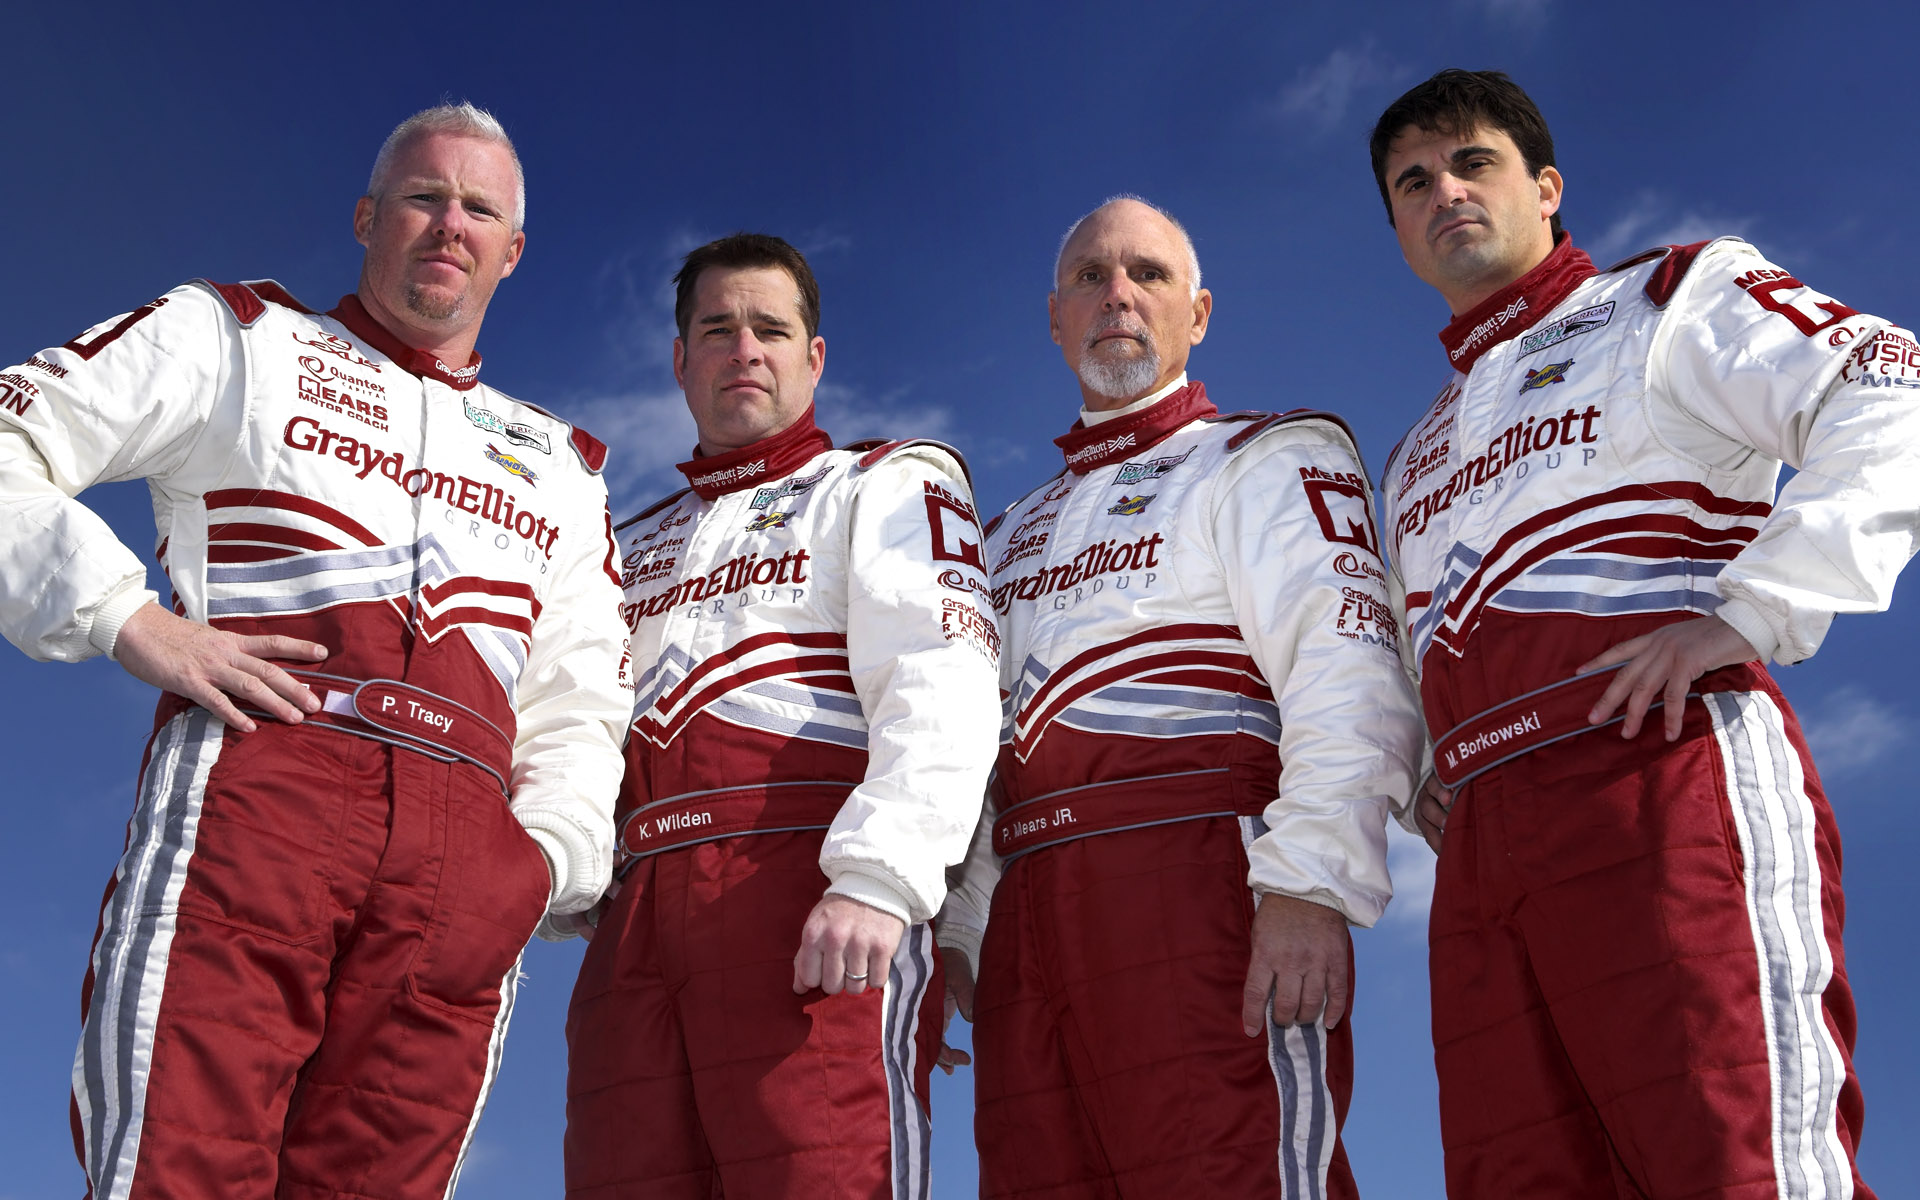 Michael Shank Racing Graydon Elliott Firesuit